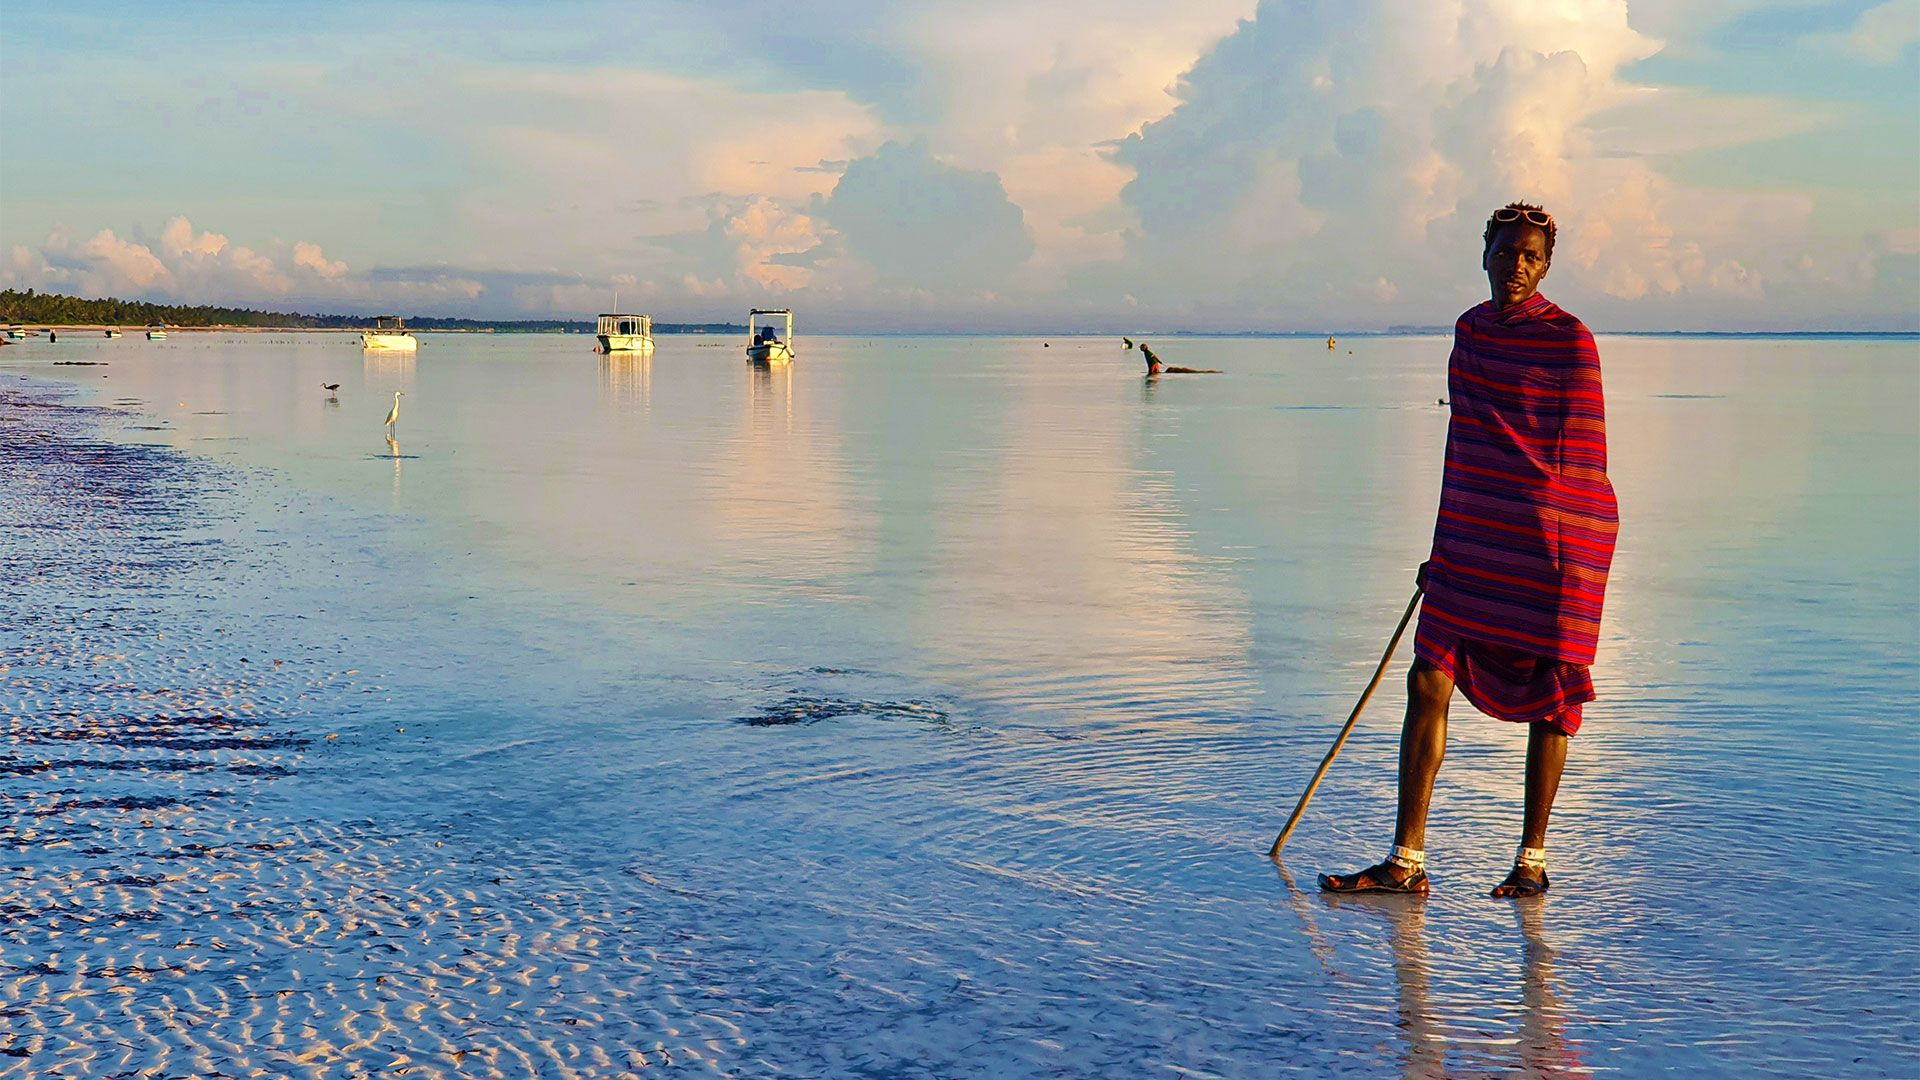 Sejur plaja Zanzibar, Tanzania - 11 Noiembrie 2021